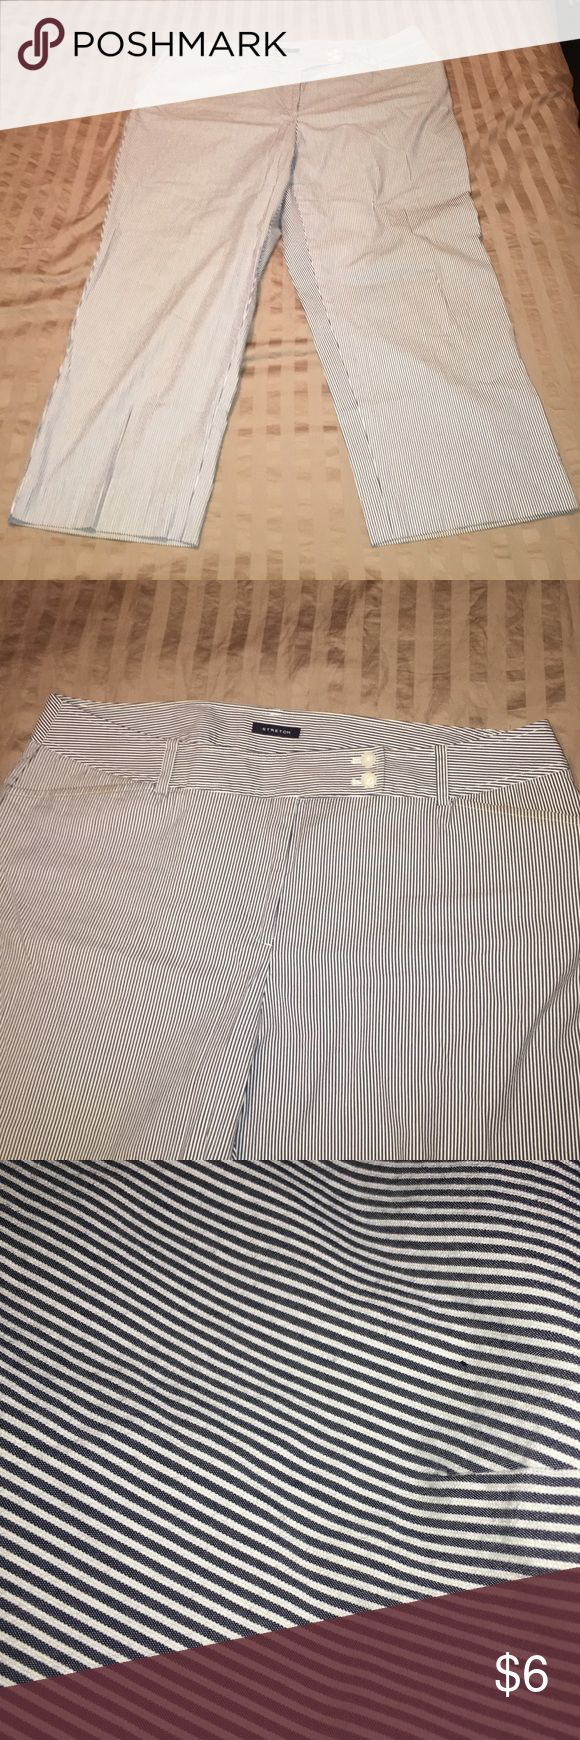 Women's Capri, like new Women's Capri pants, 26 inch inseam crop/Capri, 40 inch waist, 11 inch rise ---great micro stripes. Front pockets. Easy wear Jones New York Pants Capris